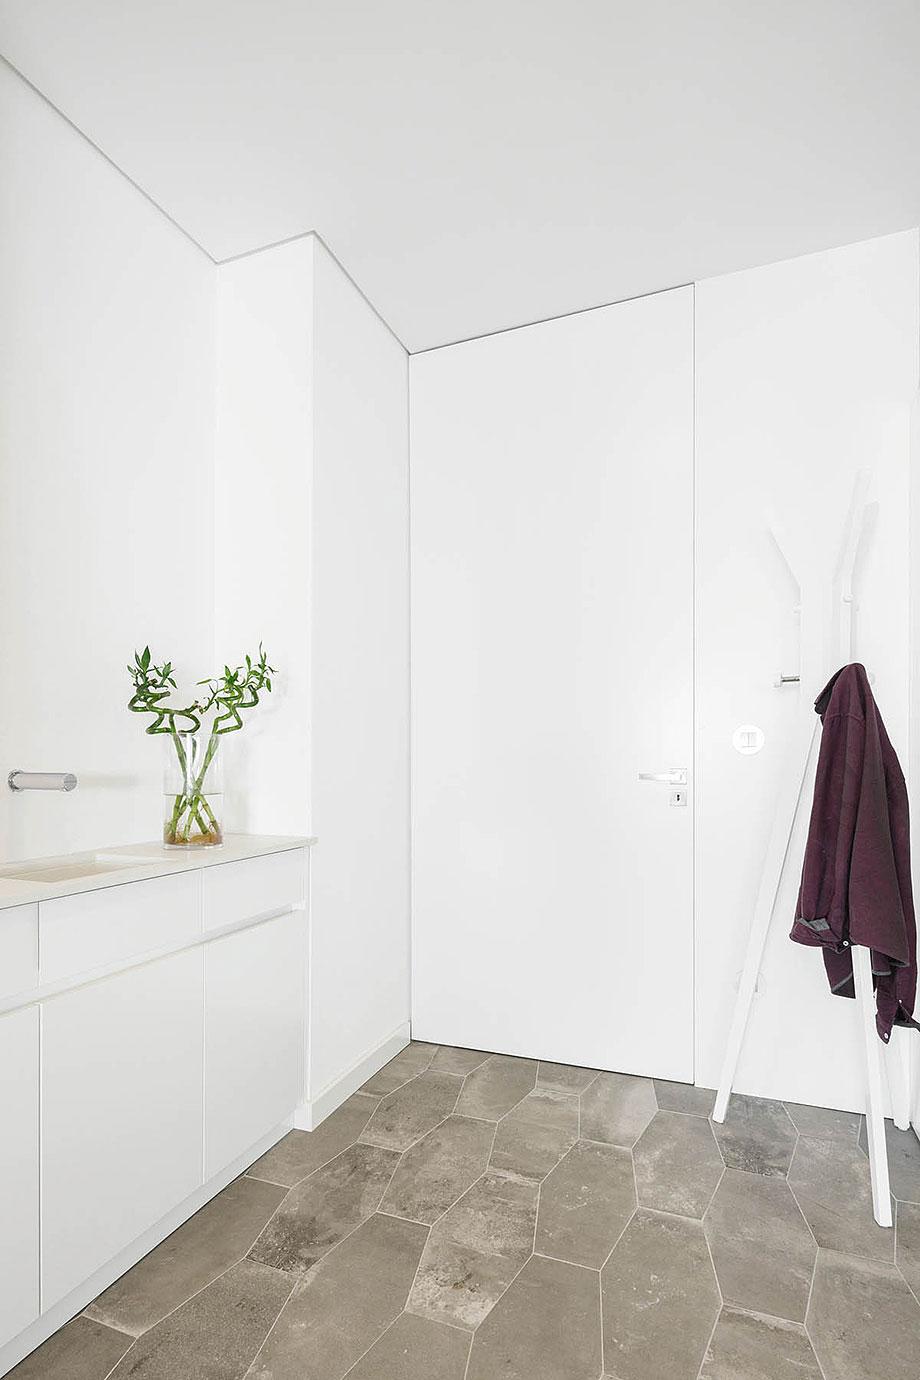 apartamento en oporto por paulo moreira architectures (11) - foto ivo tavares